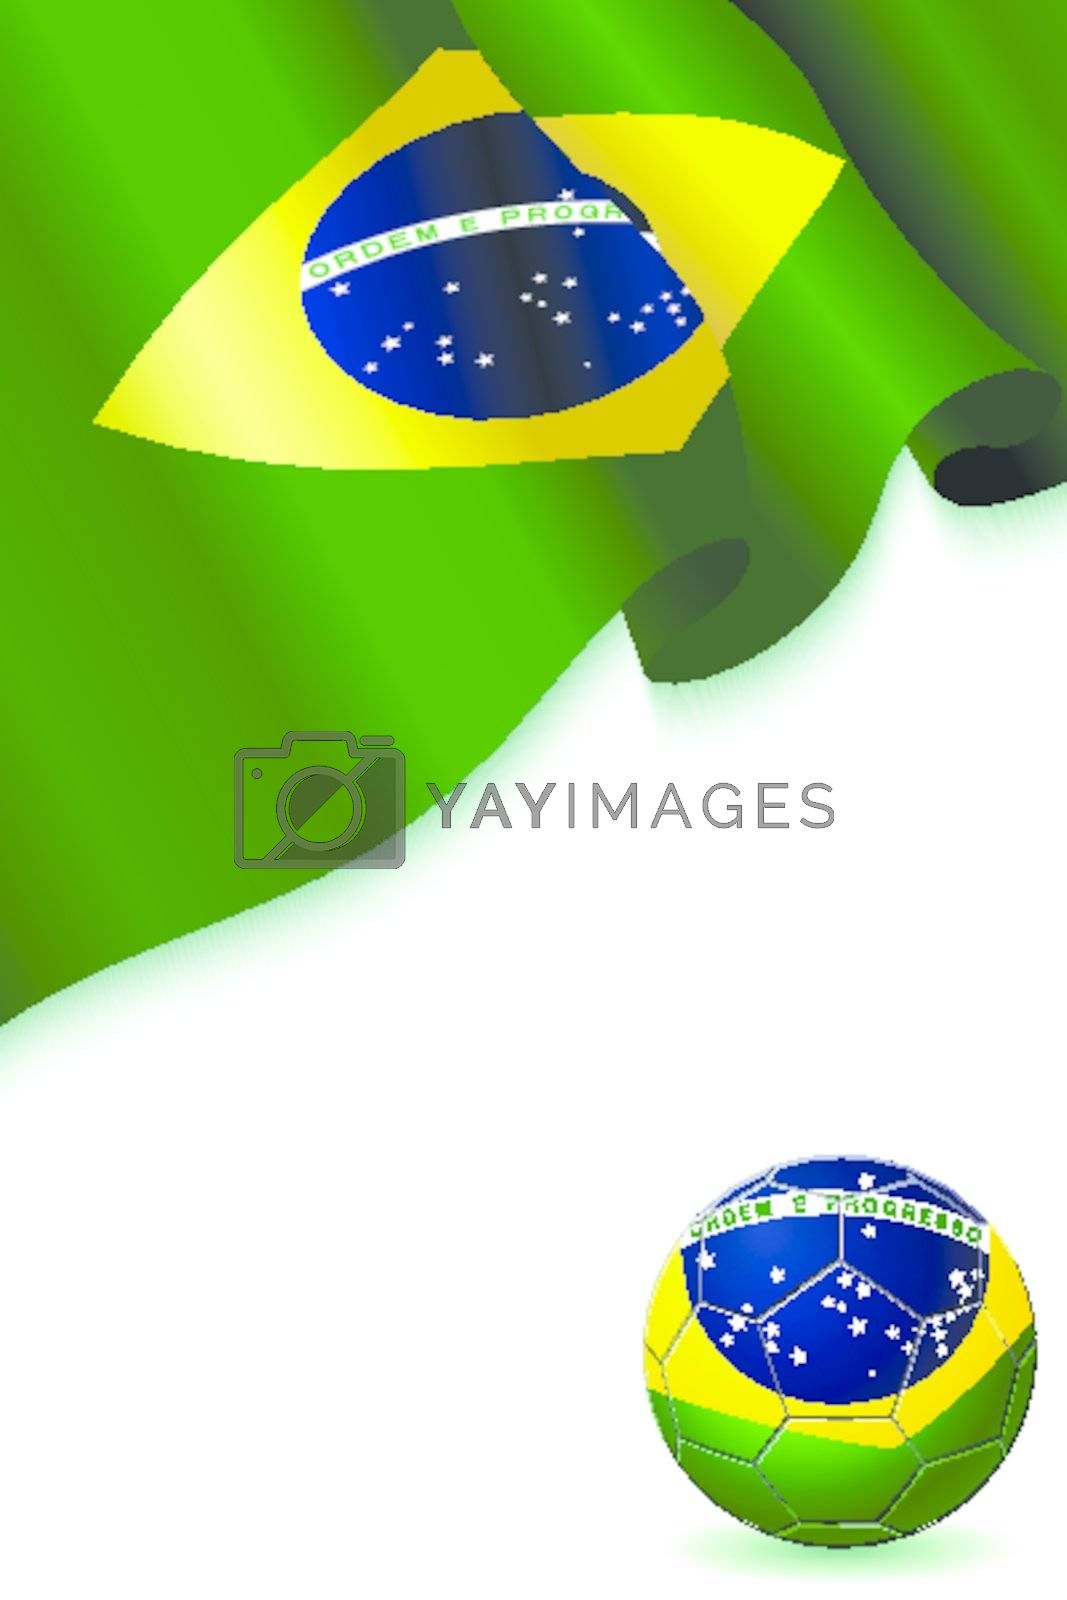 floating, streaming Flag of Brazil with Barsil soccer Football